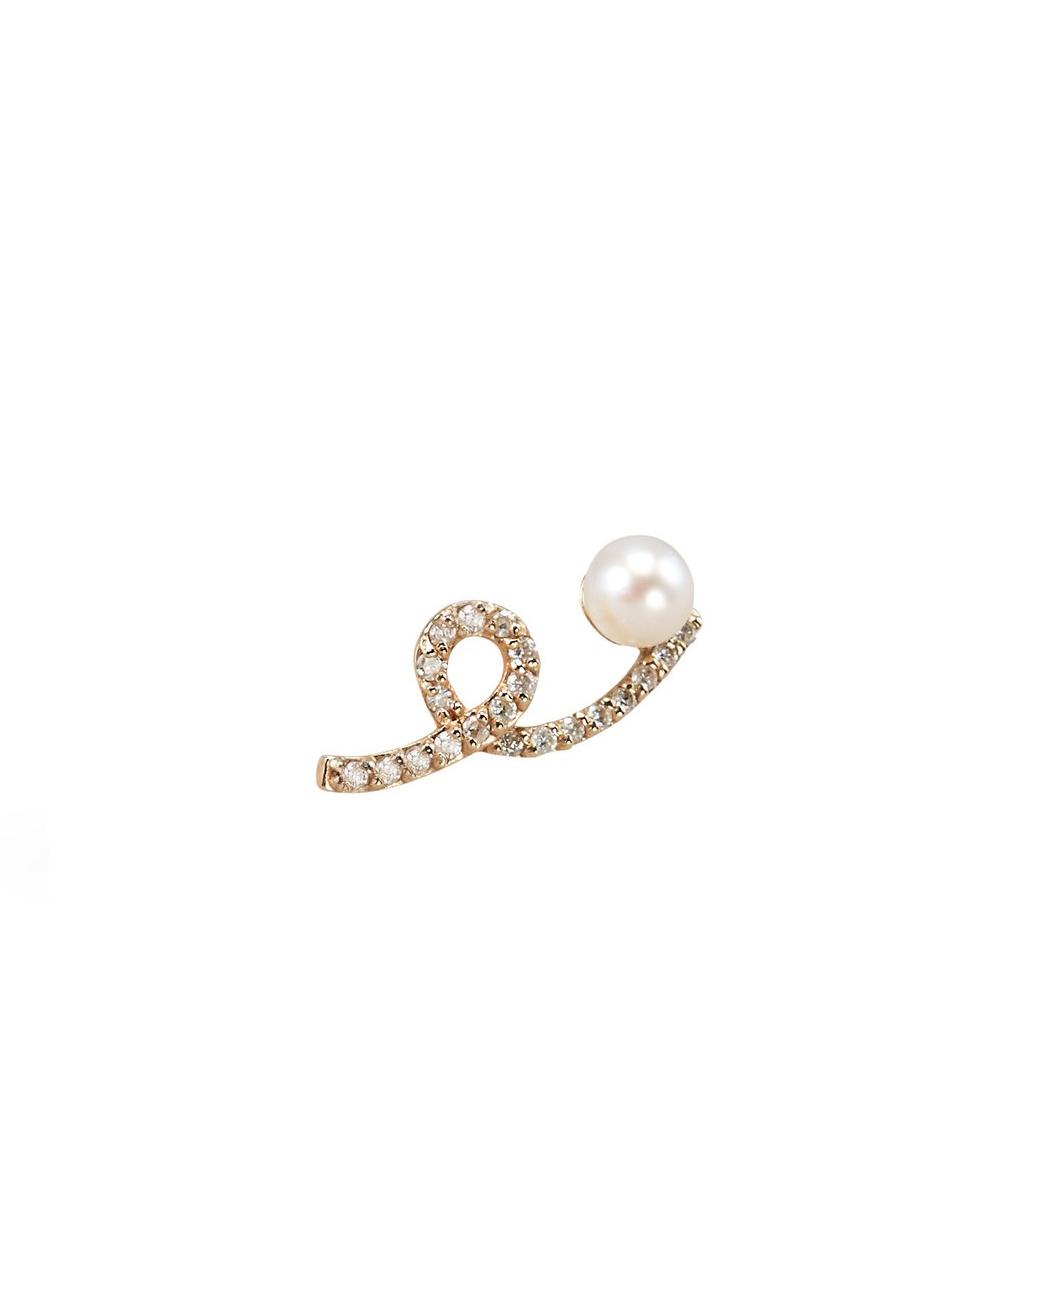 pearl wedding earrings paige novick